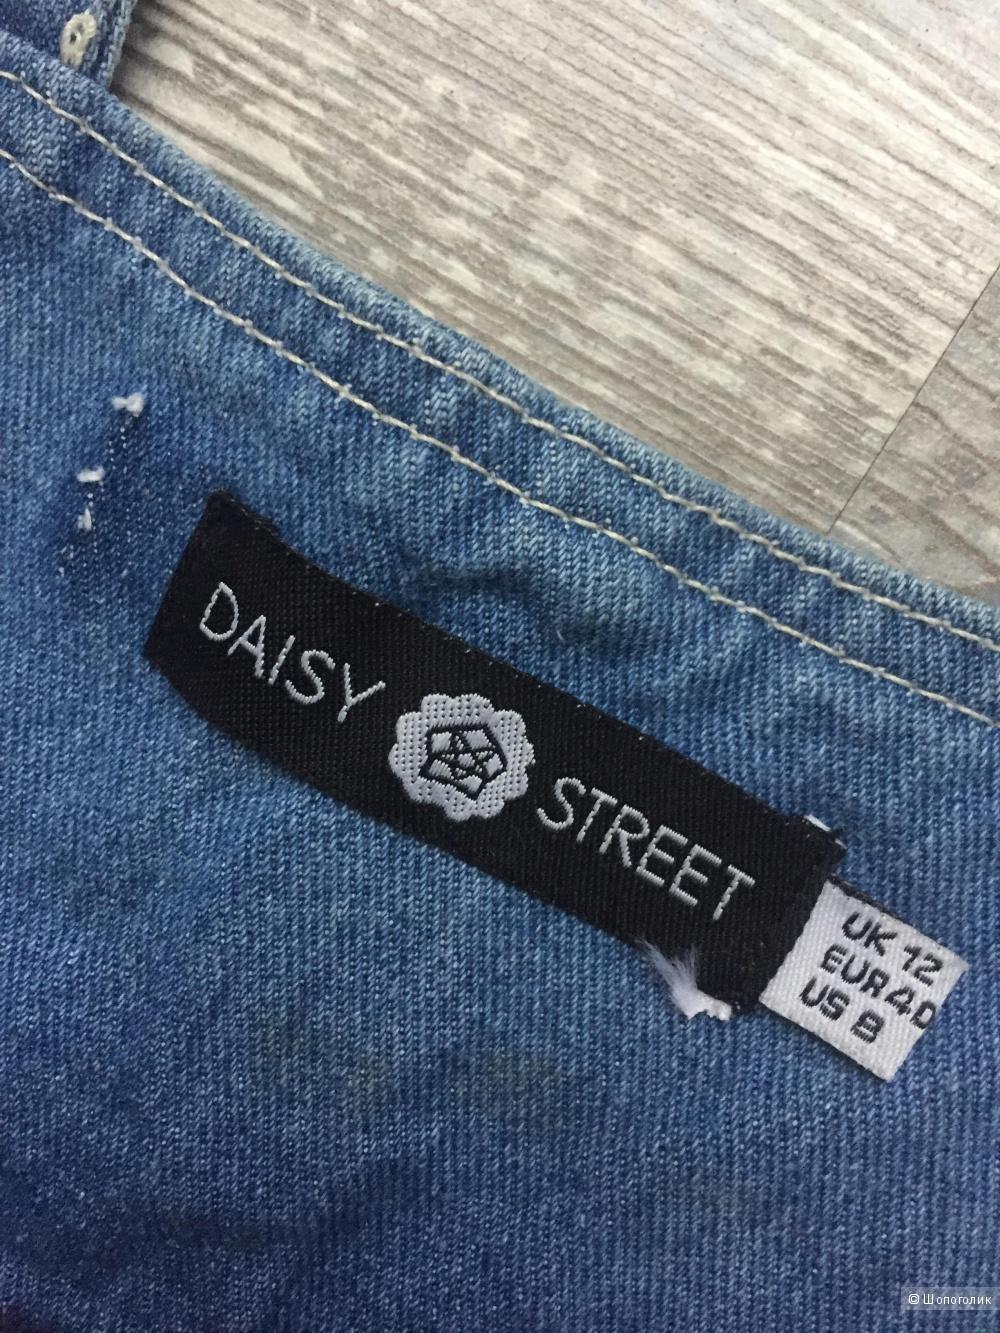 Джинсовый сарафан Daisy Street , размер EU 40 (uk 12).